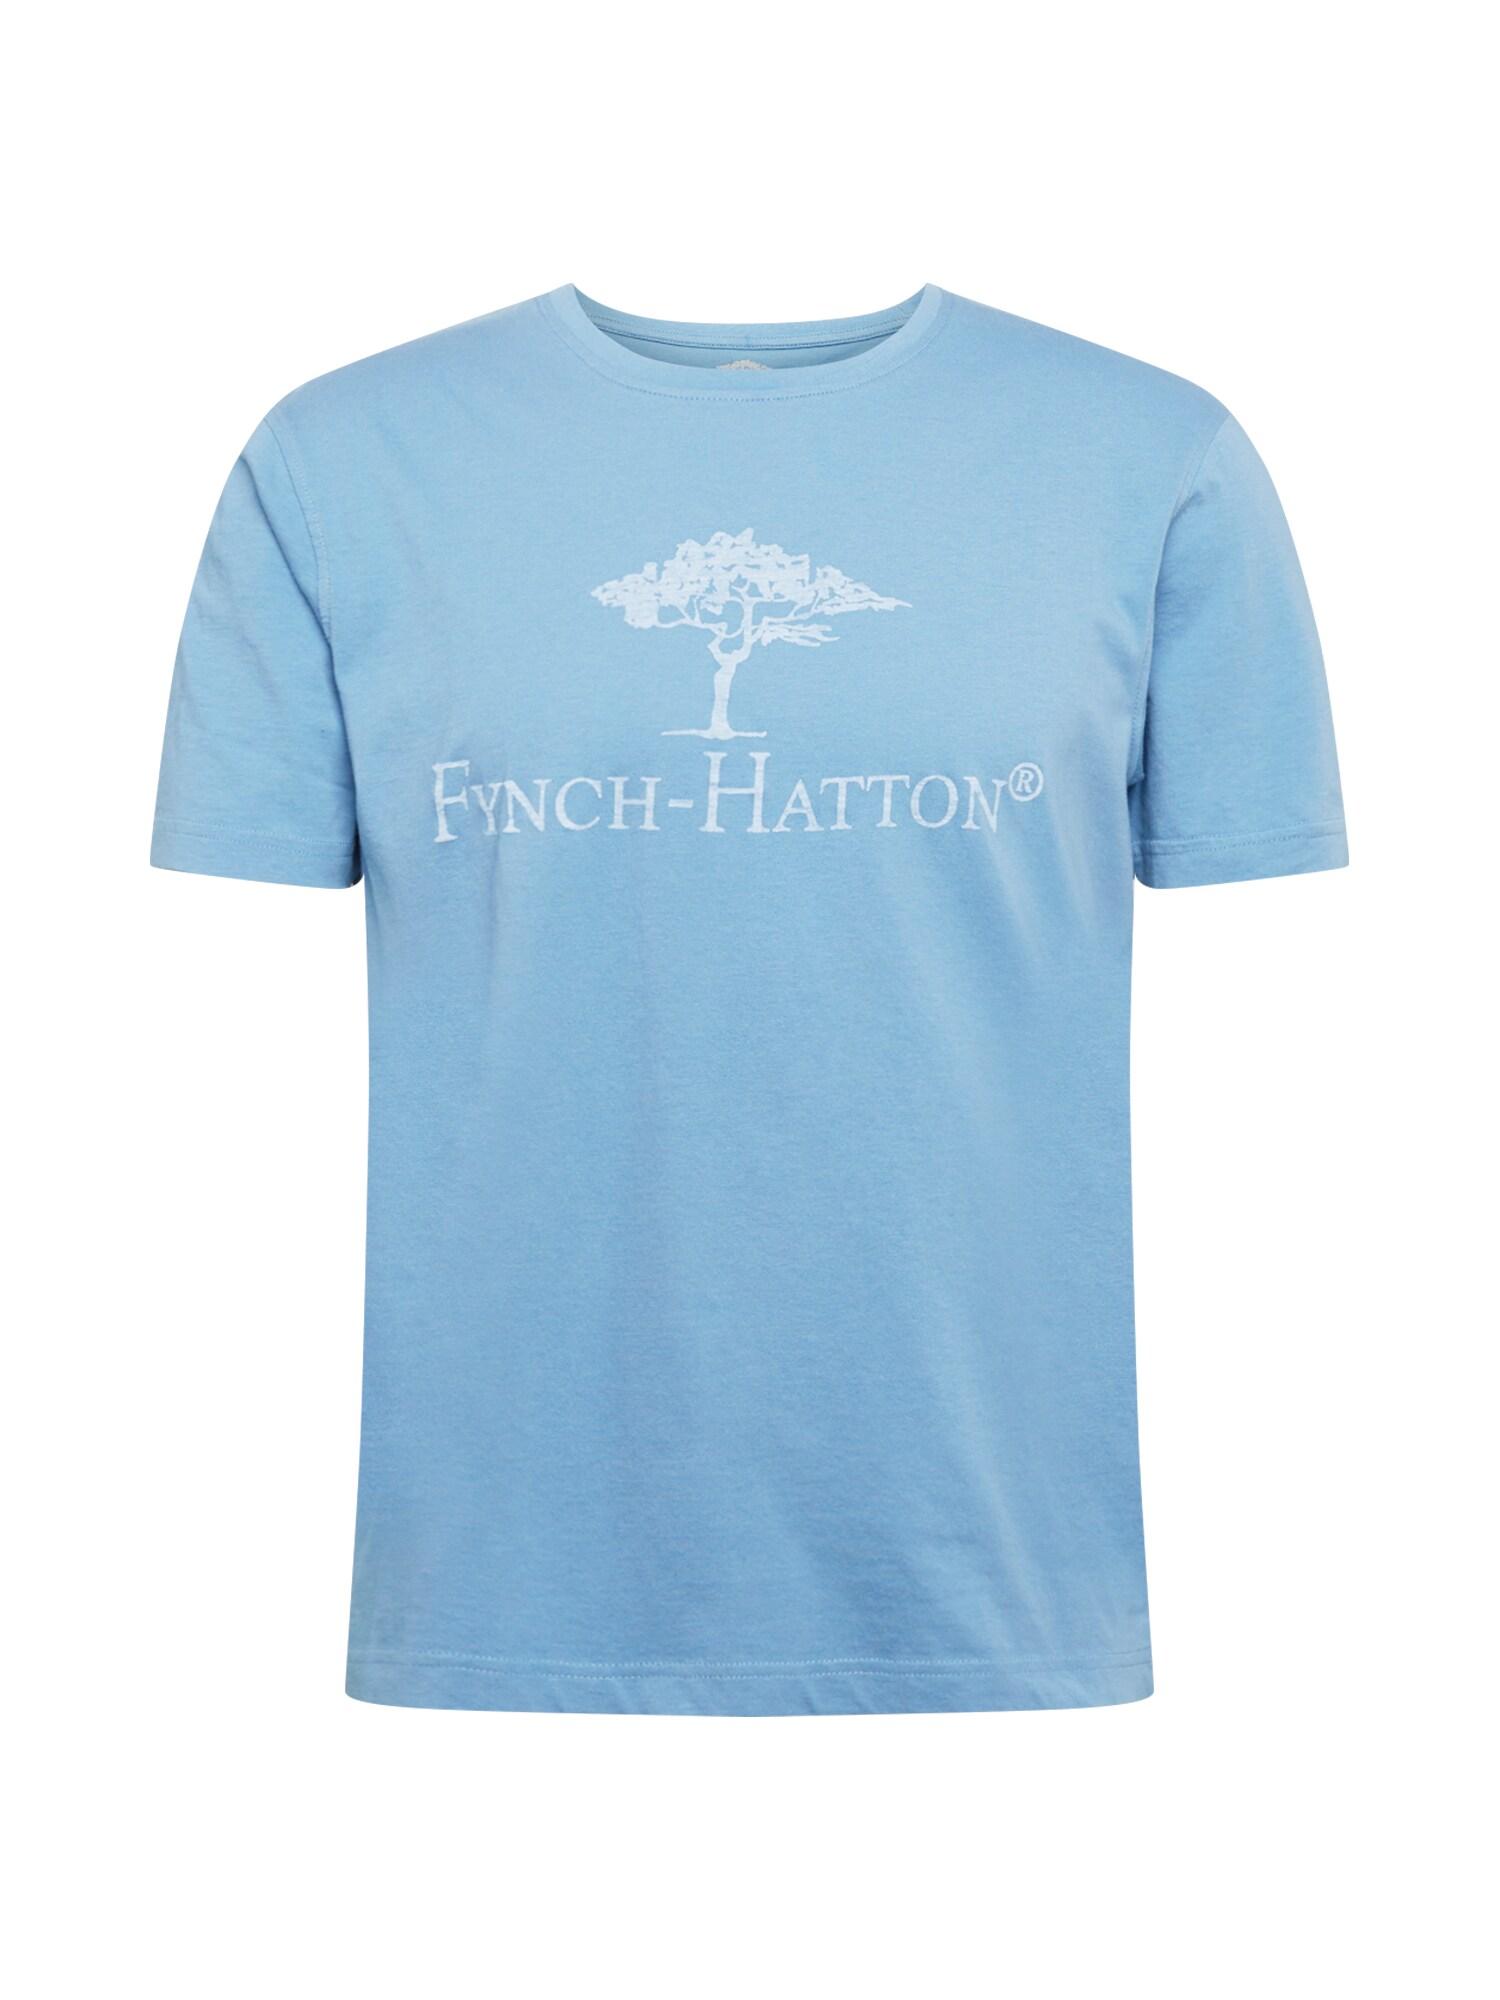 FYNCH-HATTON Marškinėliai mėlyna dūmų spalva / balta